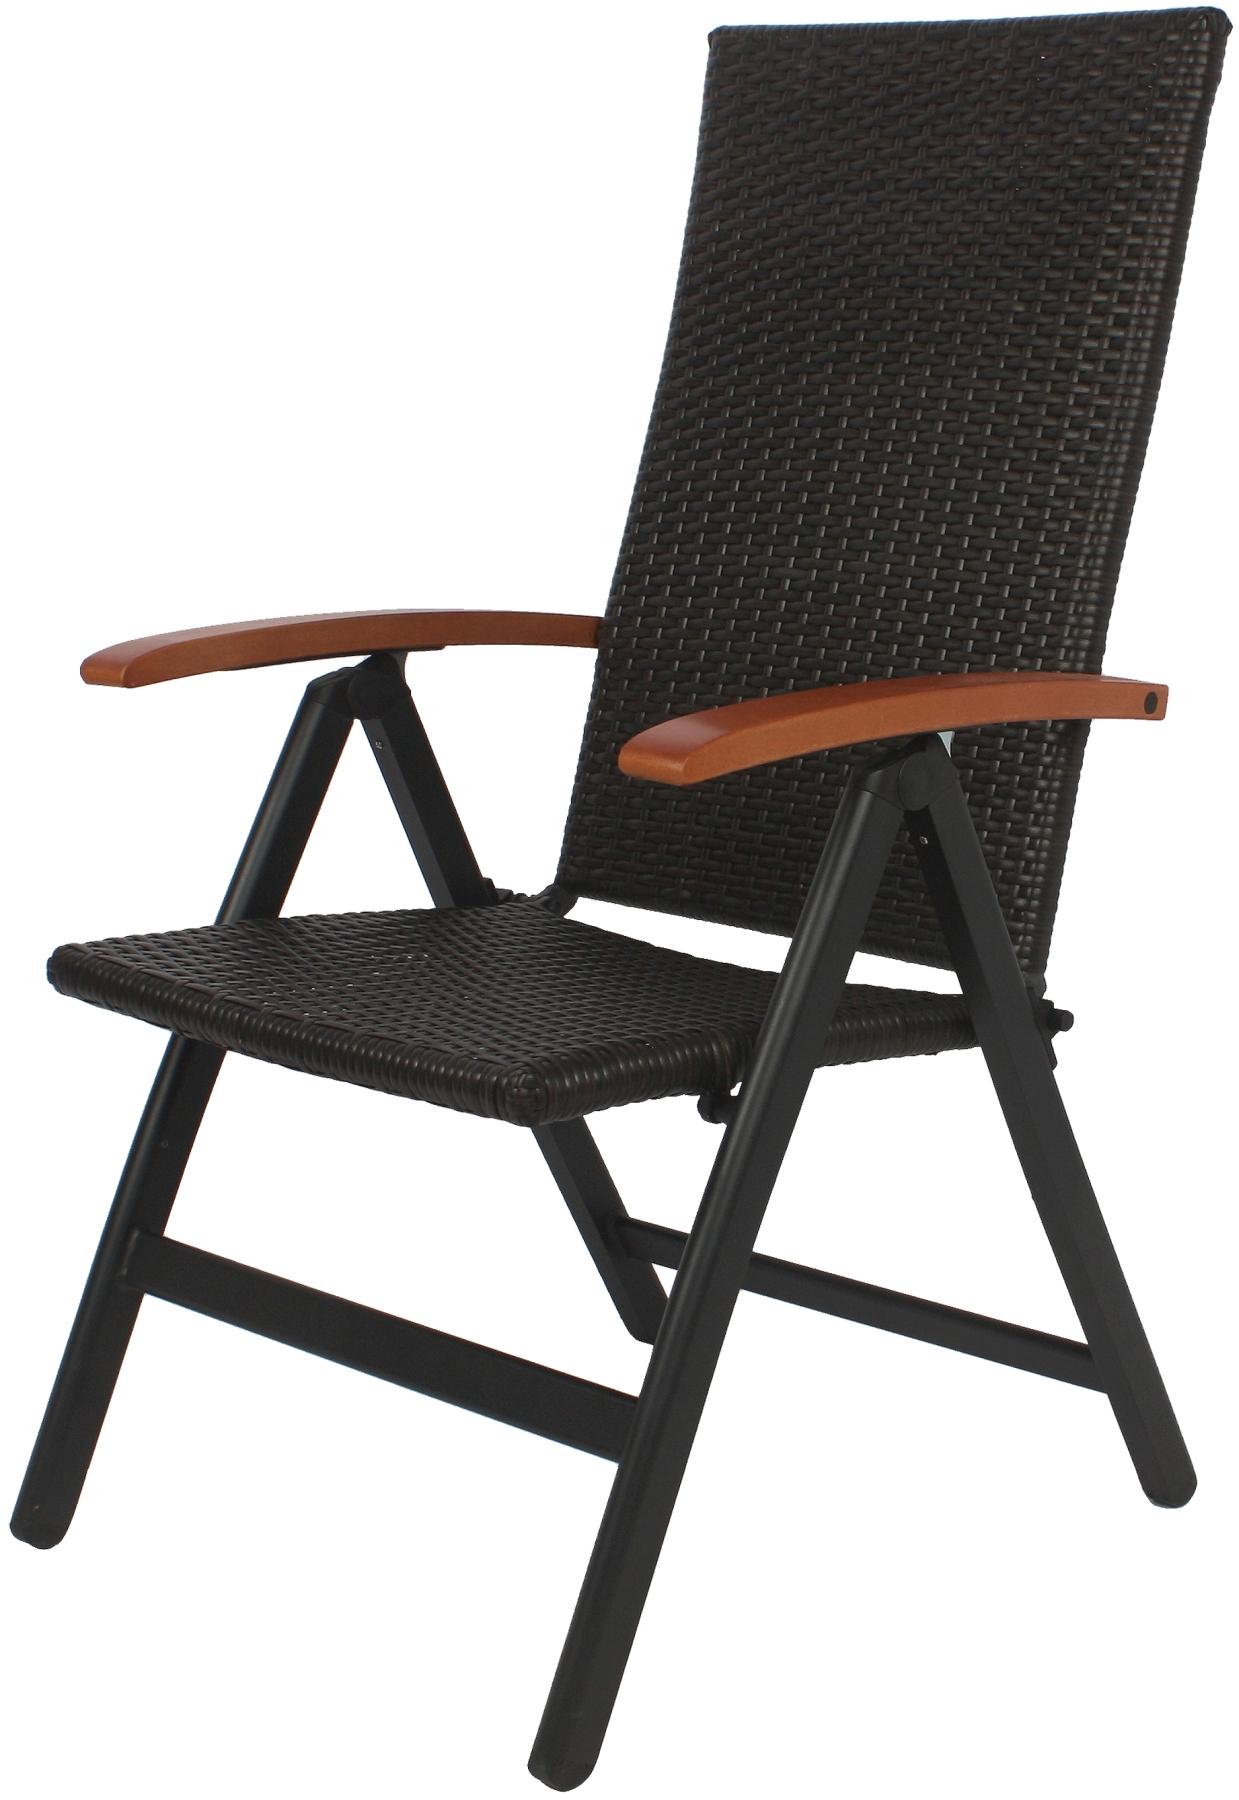 1 stück stuhl klappstuhl gartenstuhl